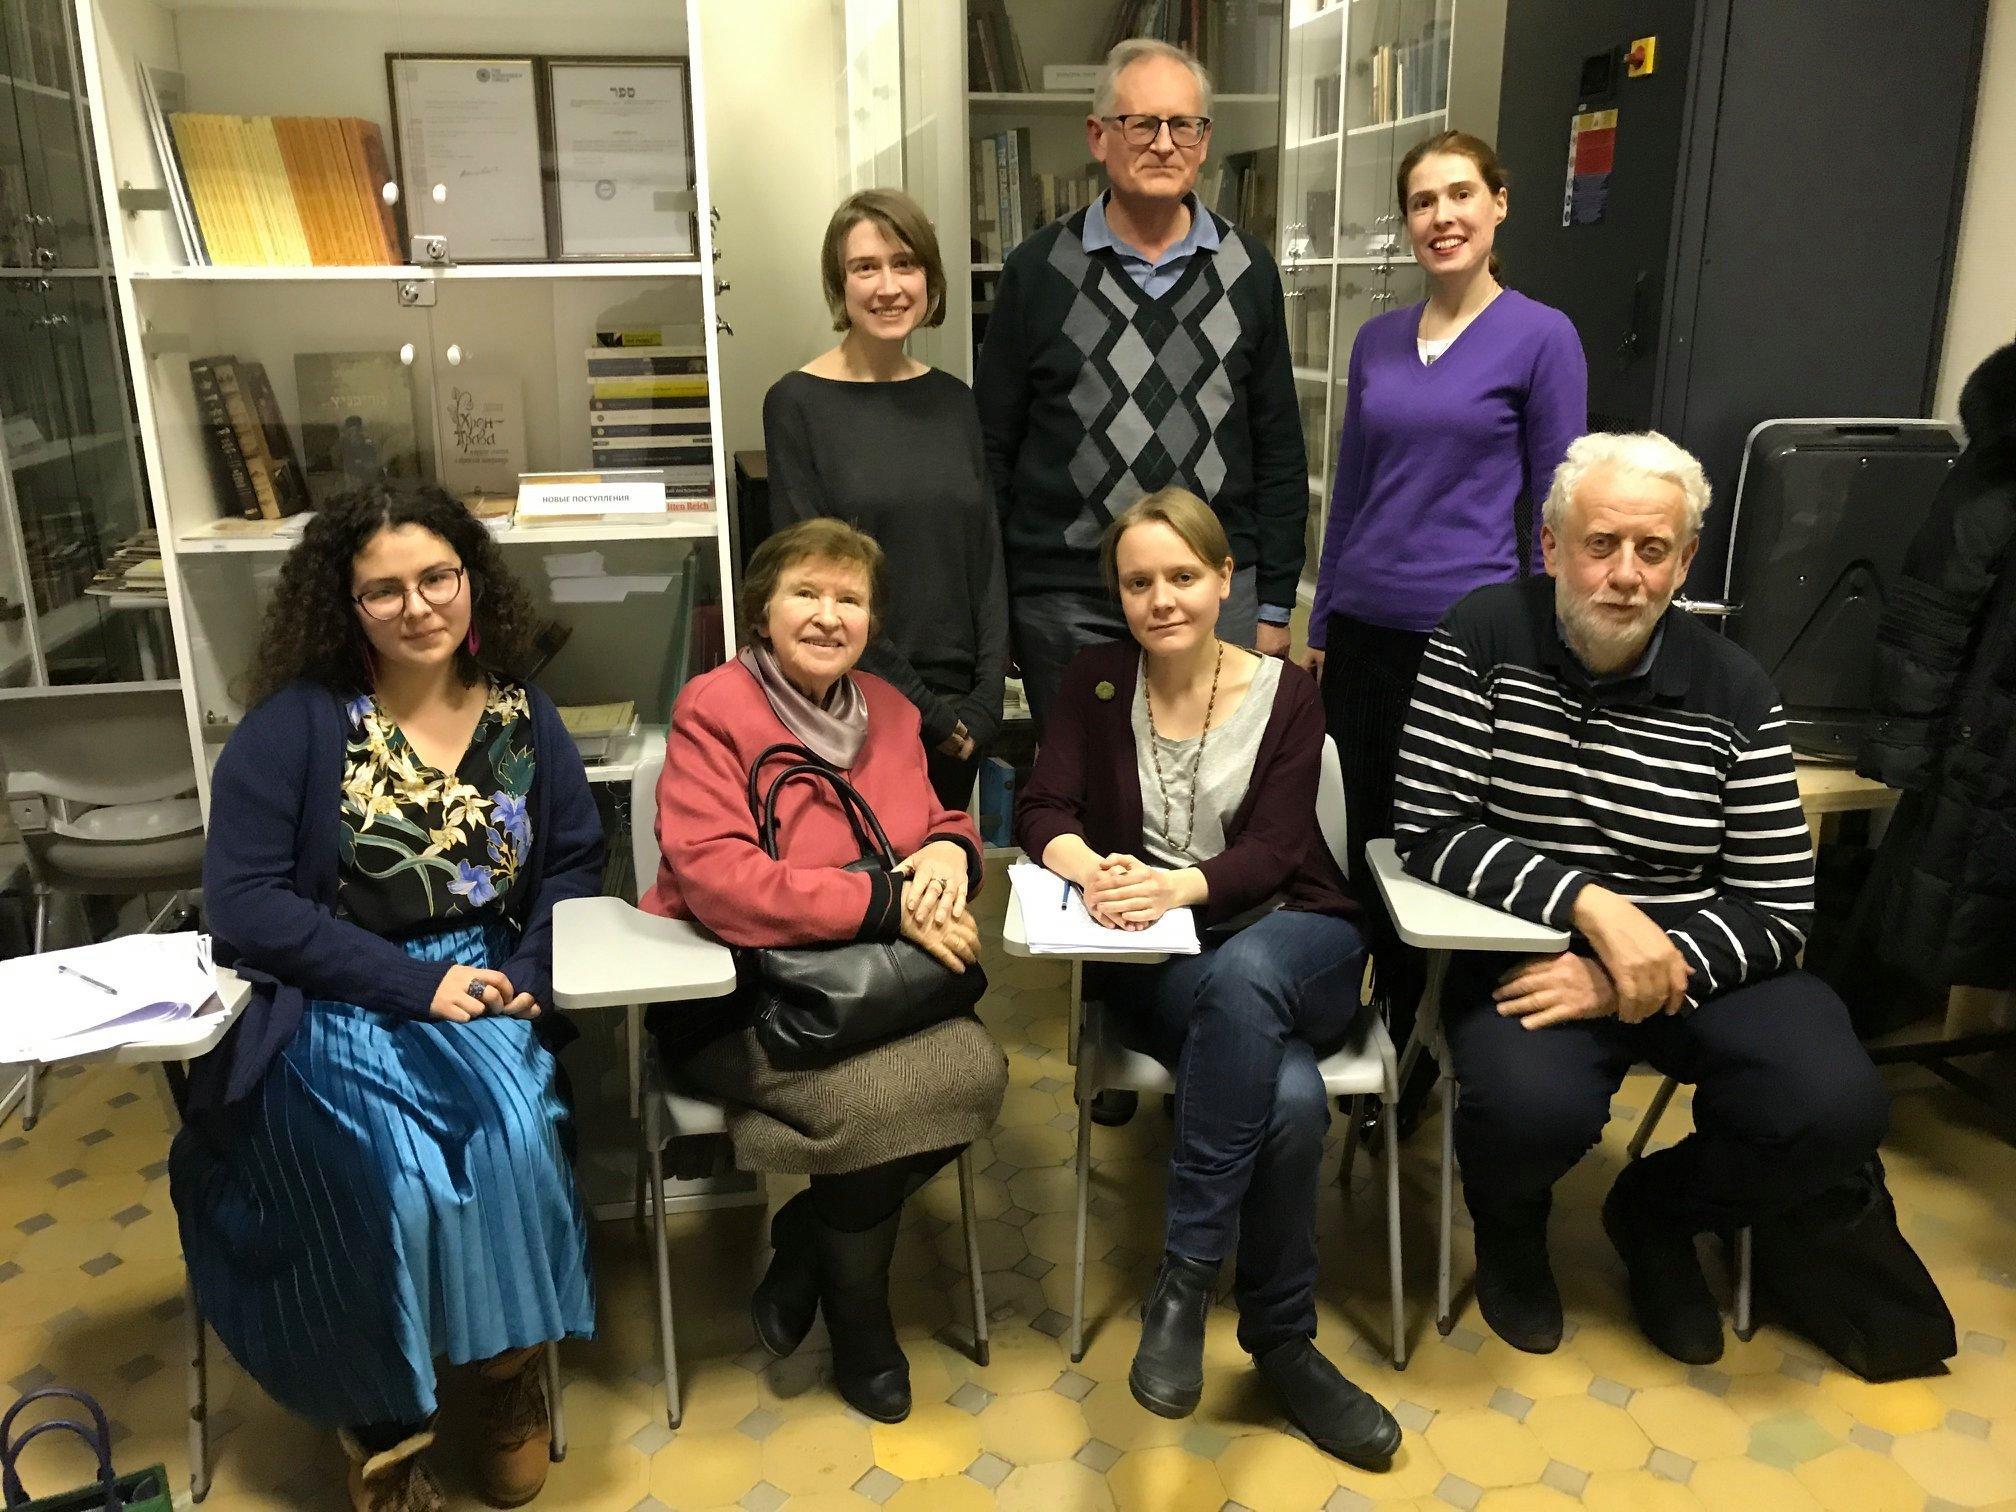 <p>Mikhail Krutikov's visit to the Jewish Museum of Moscow's <em>leyen krayz. </em>(Back row: Olga Vinogradova, Mikhail Krutikov, Lyubov&nbsp;Lavrova.)</p>